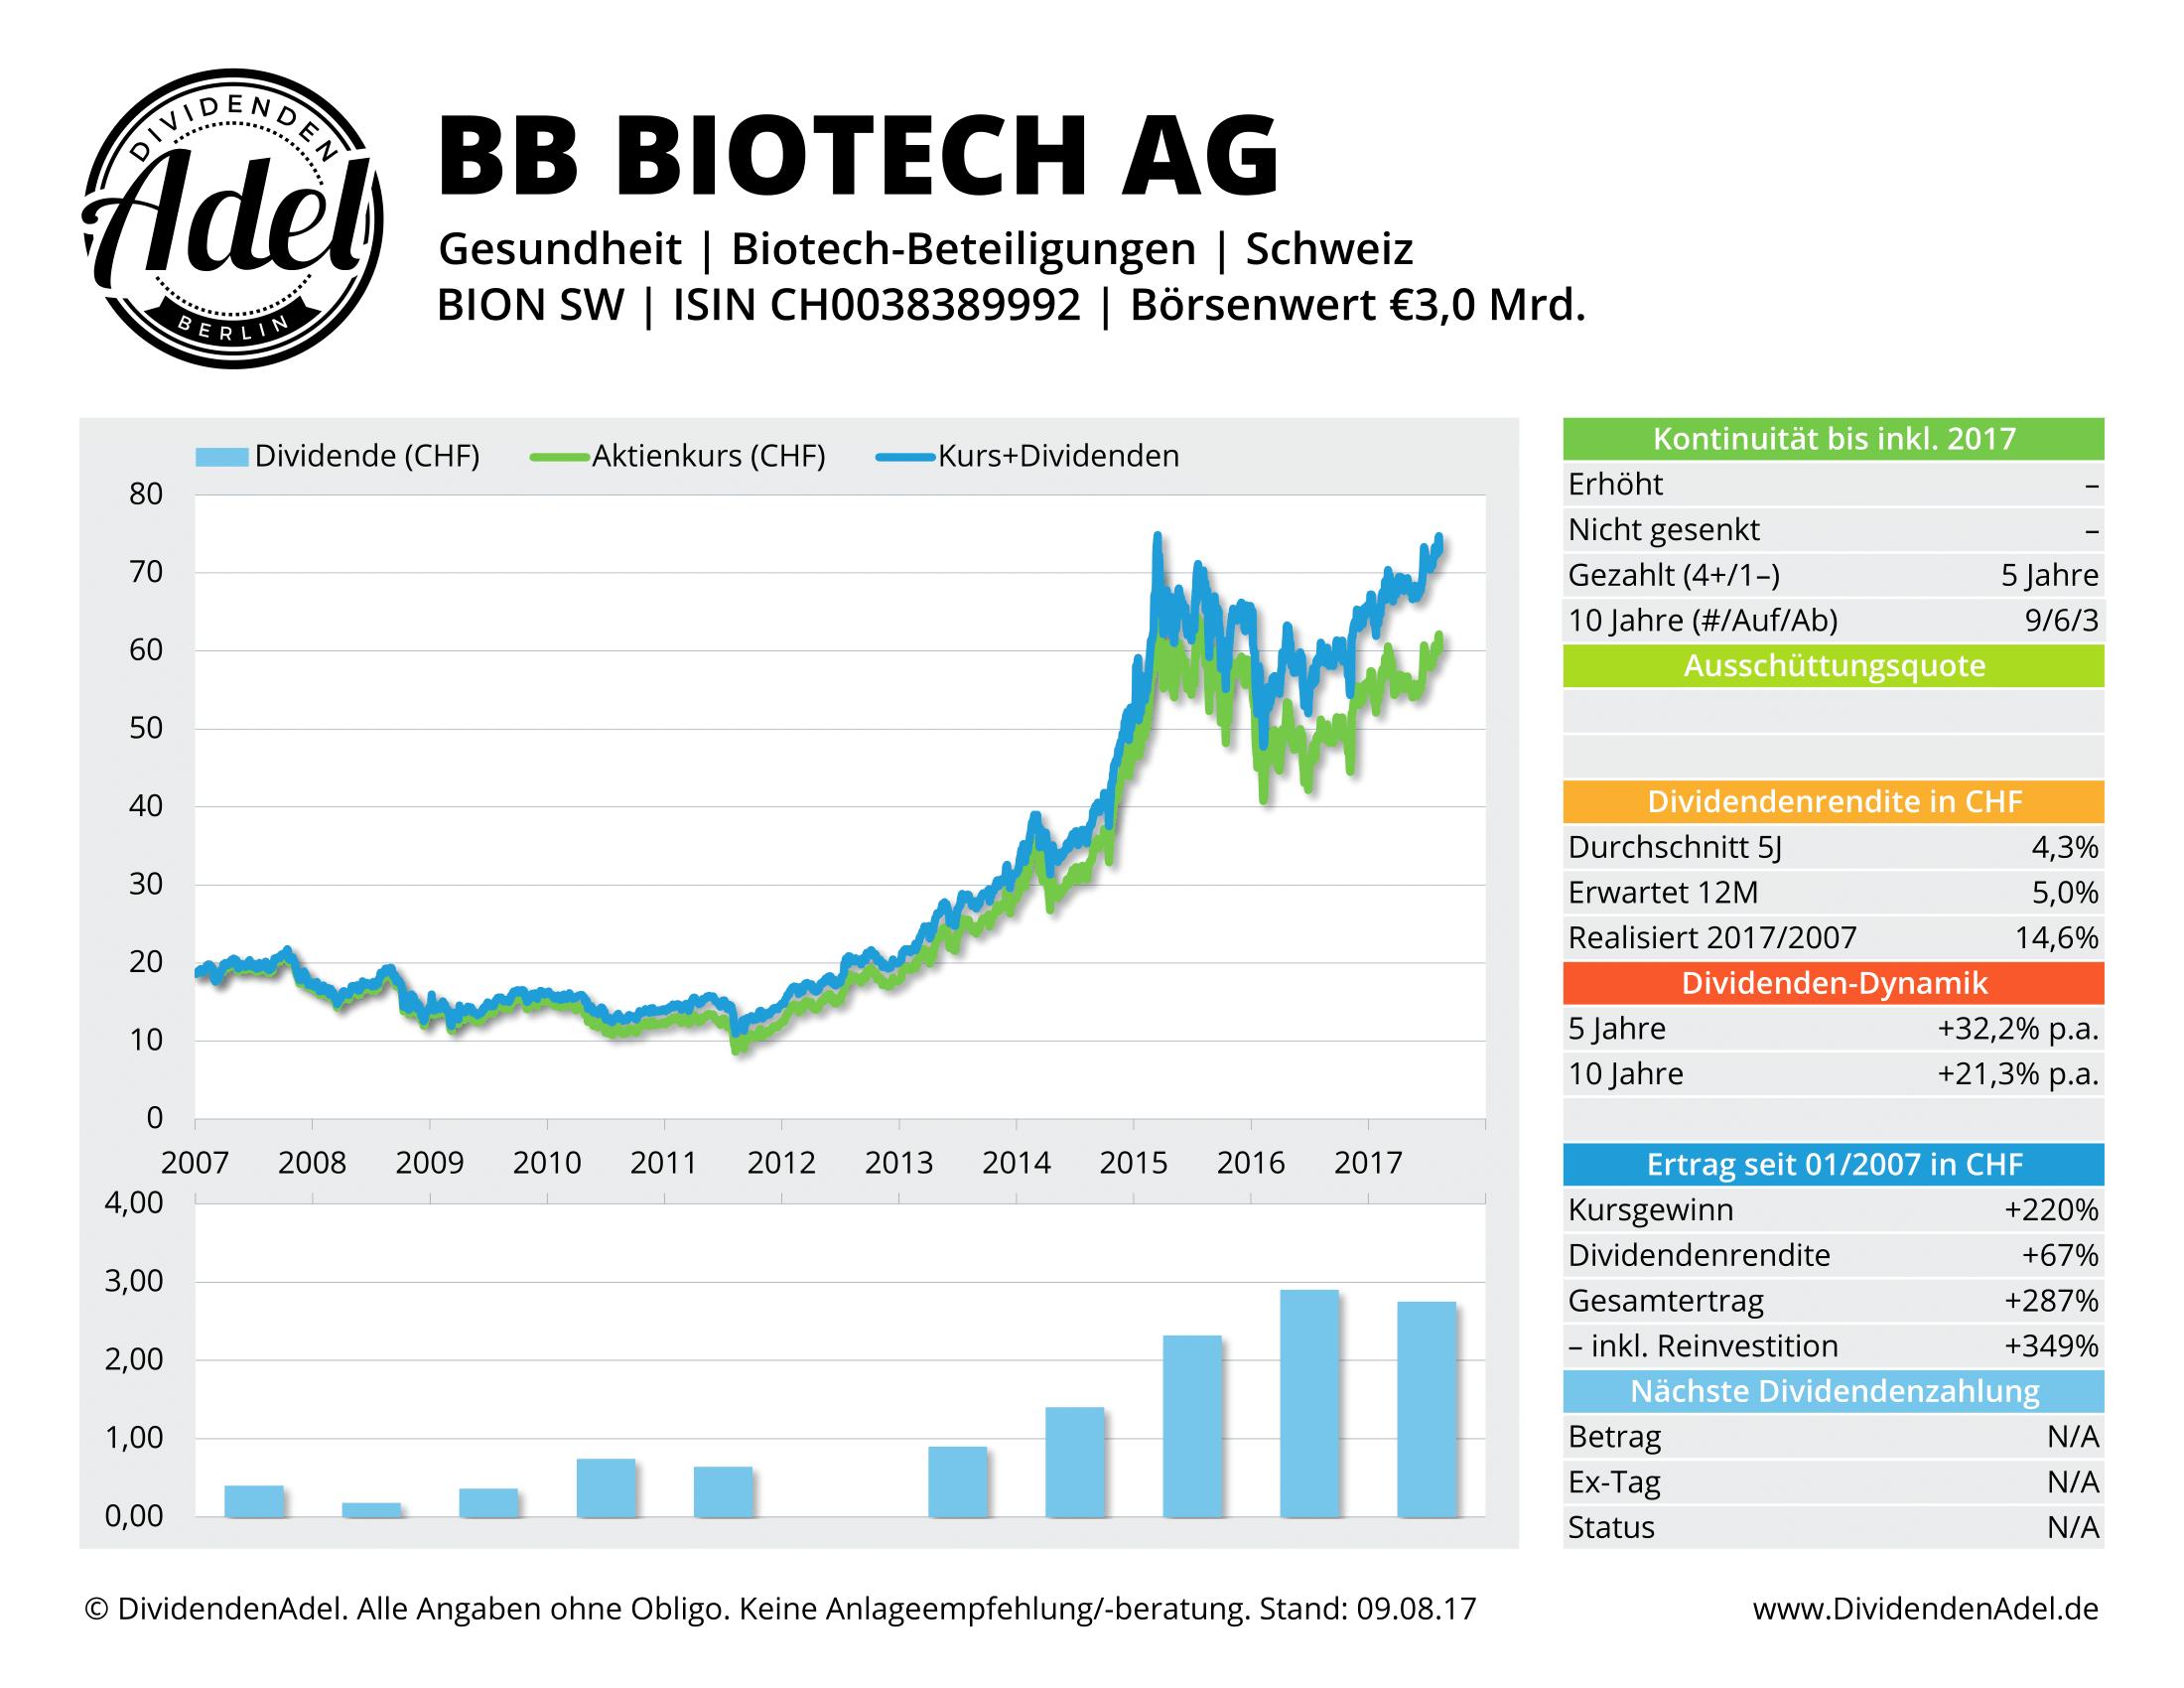 BB BIOTECH -REG DividendenAdel-Profil